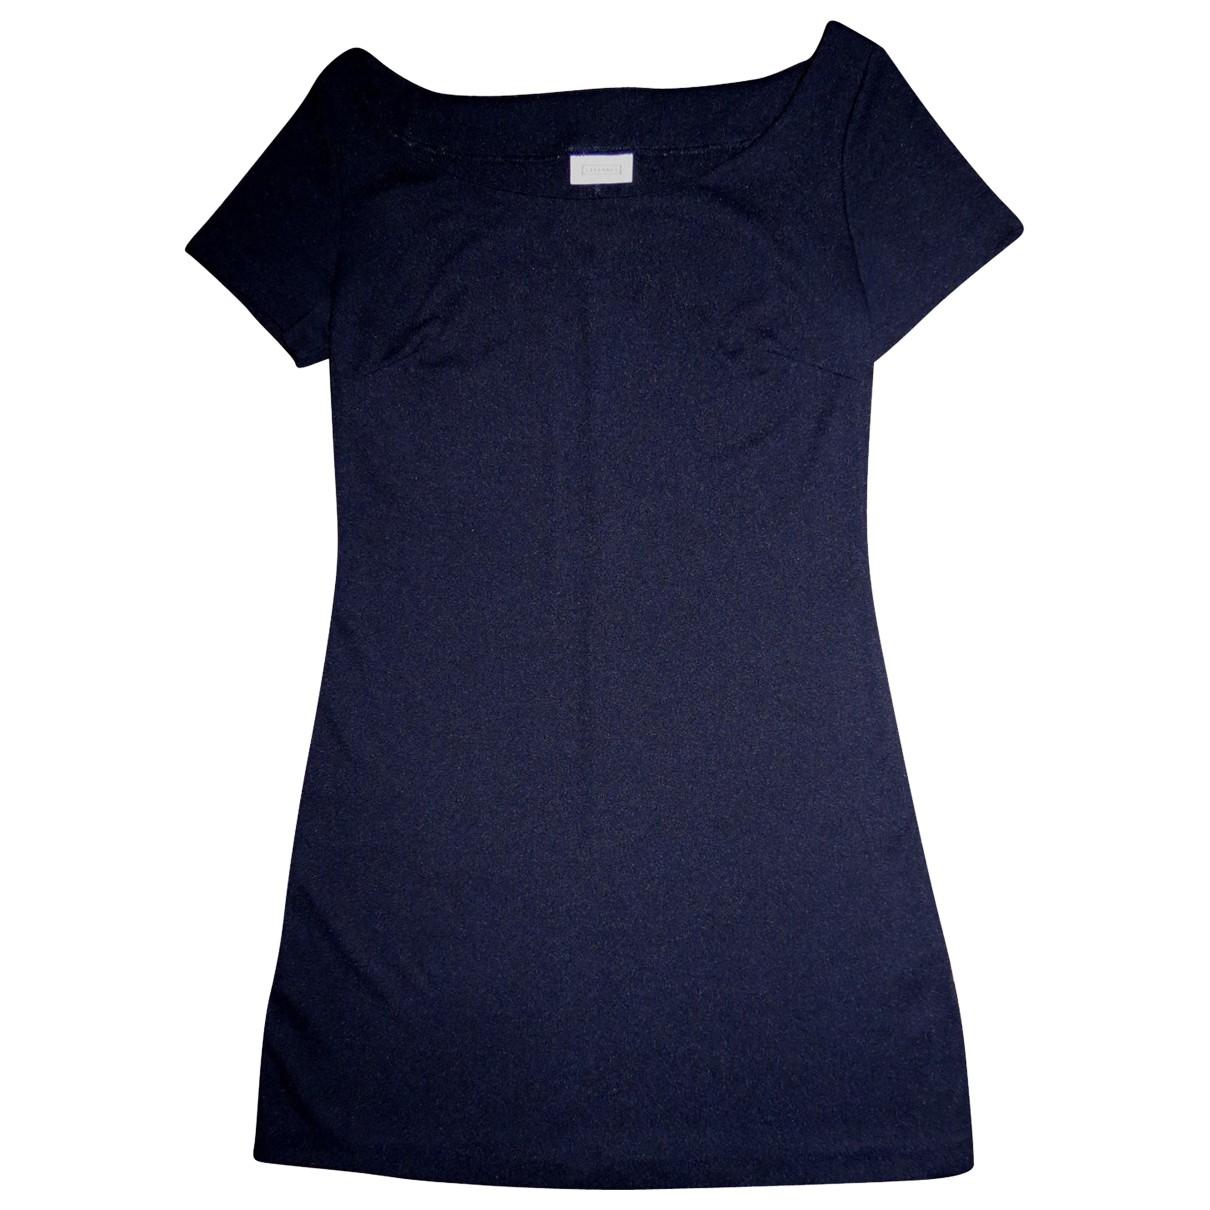 Stefanel \N Kleid in  Schwarz Polyester